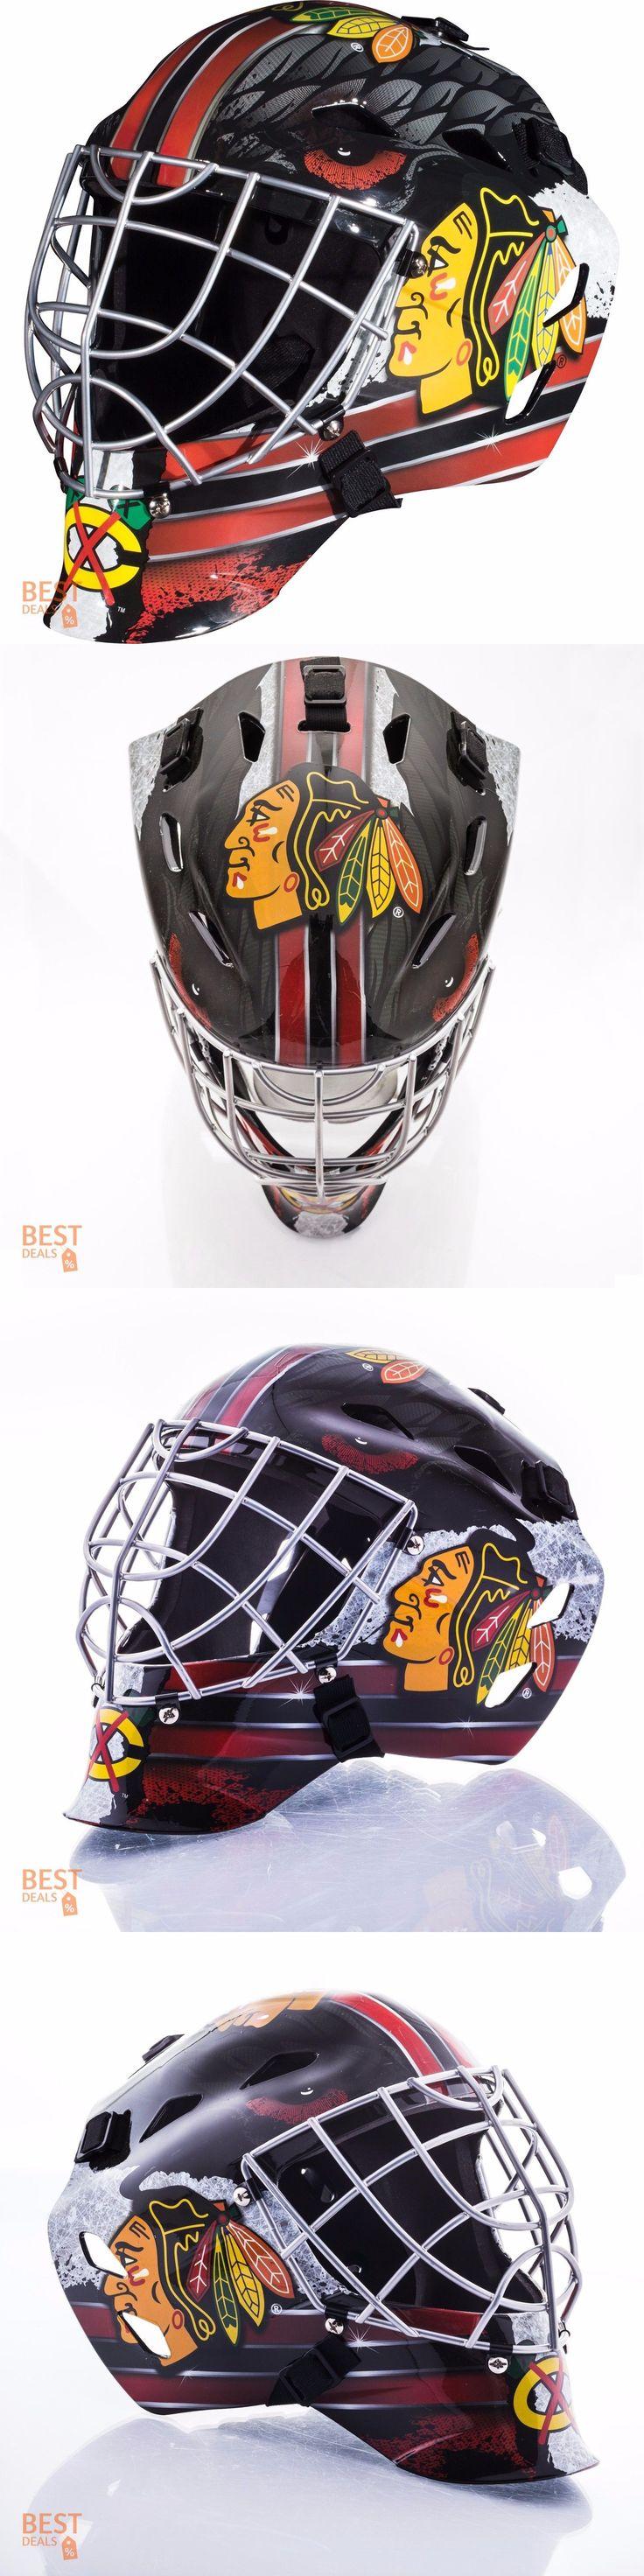 Face Masks 79762: Hockey Goalie Mask Youth Junior Nhl Chicago Blackhawks Franklin Sports Kids Gear -> BUY IT NOW ONLY: $74.99 on eBay!